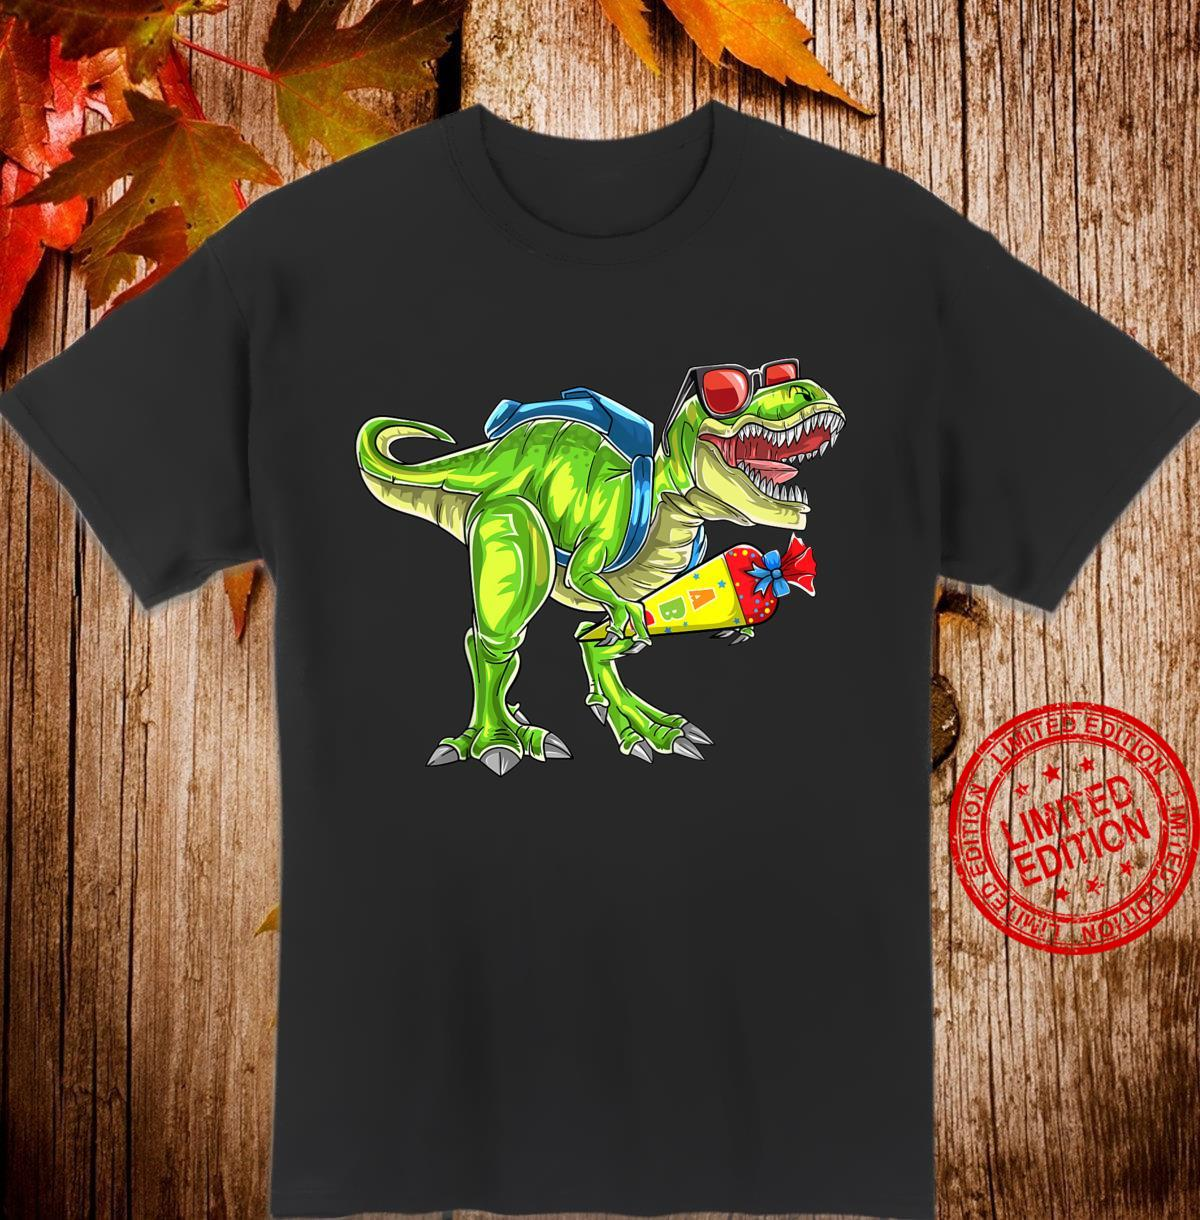 Kinder Schulkind 2020 TRex Dinosaurier Jungen Mädchen Einschulung Shirt